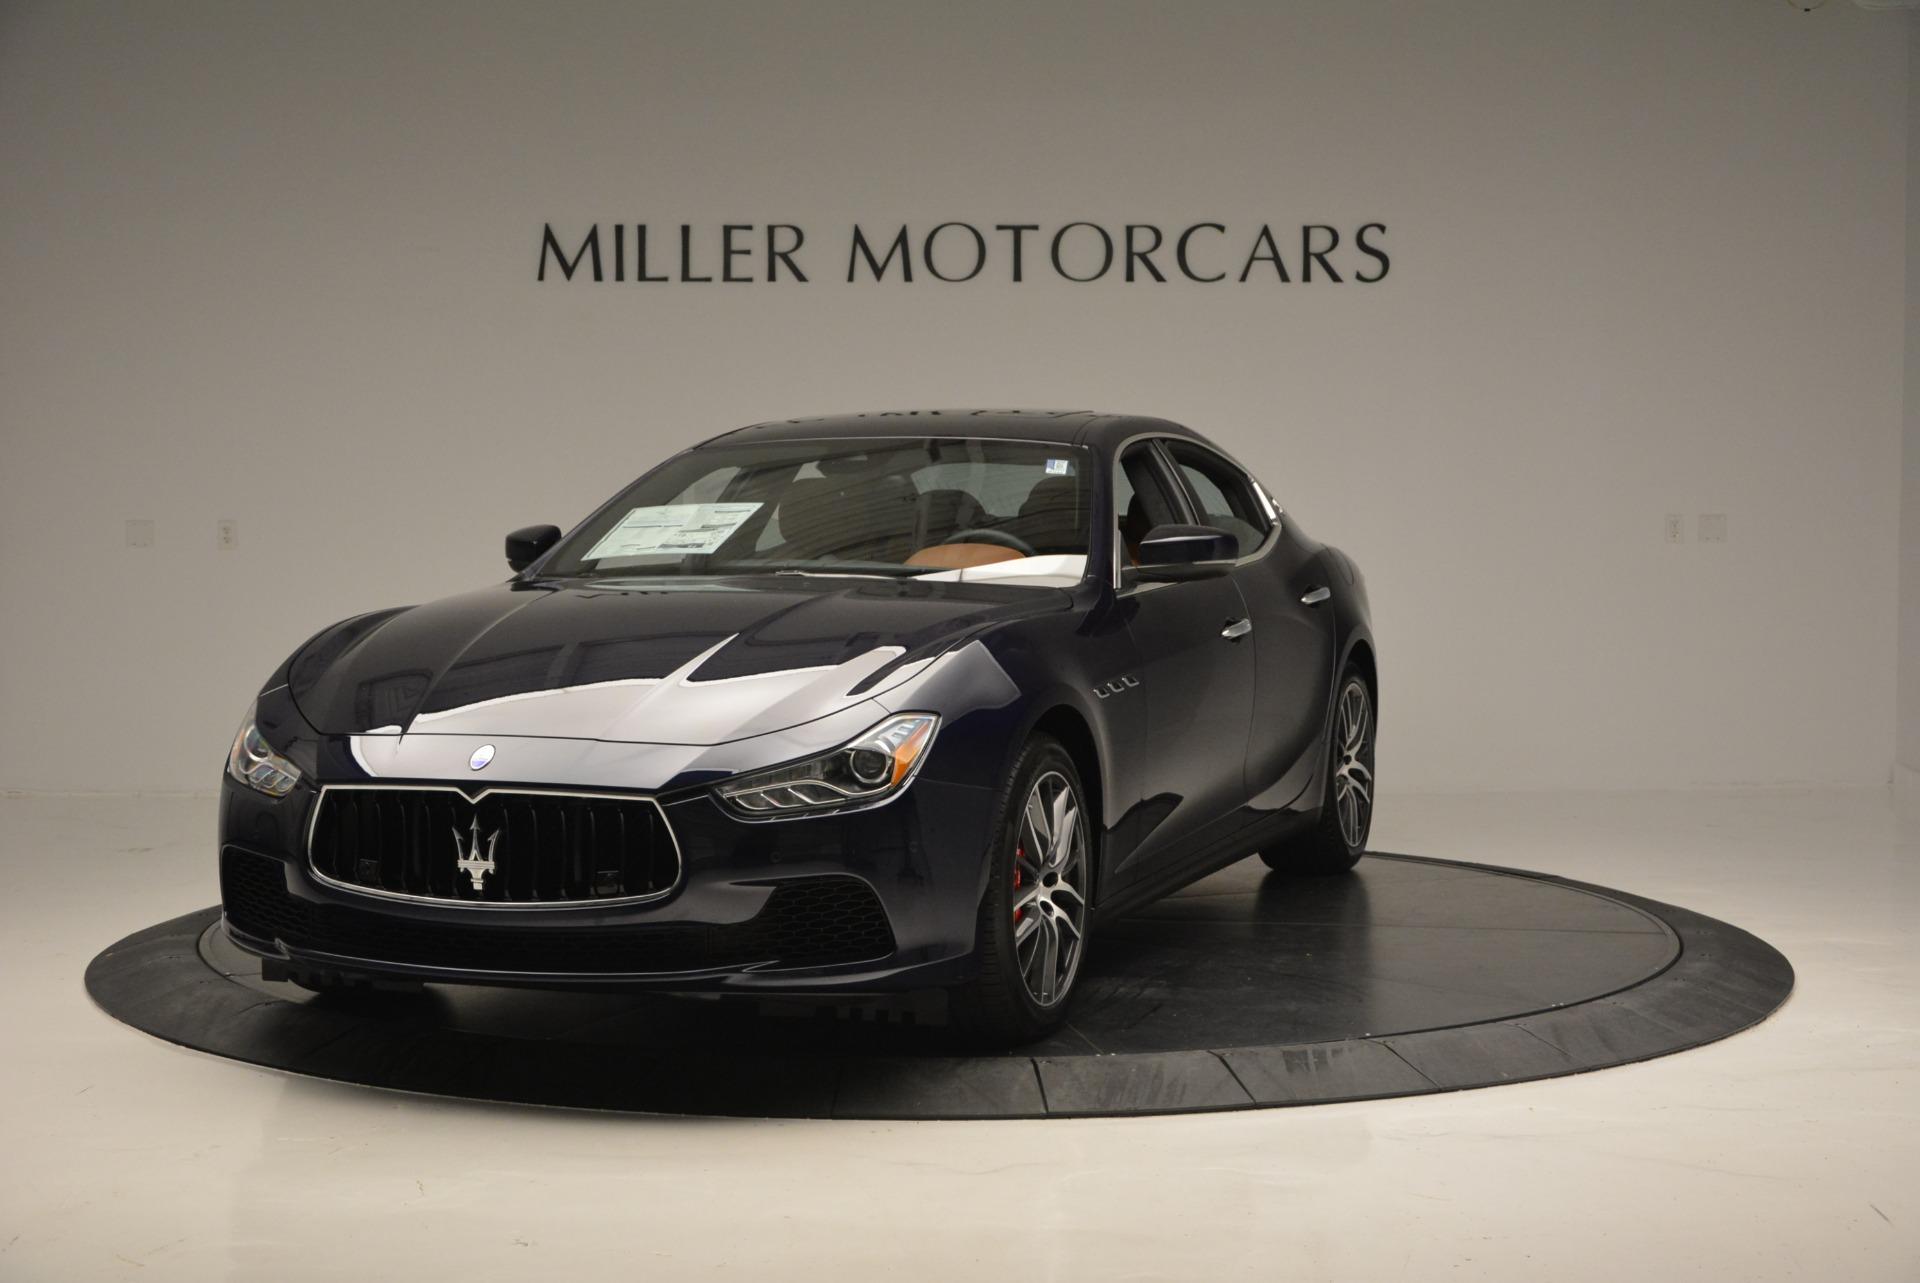 New 2017 Maserati Ghibli S Q4 For Sale In Greenwich, CT 714_main